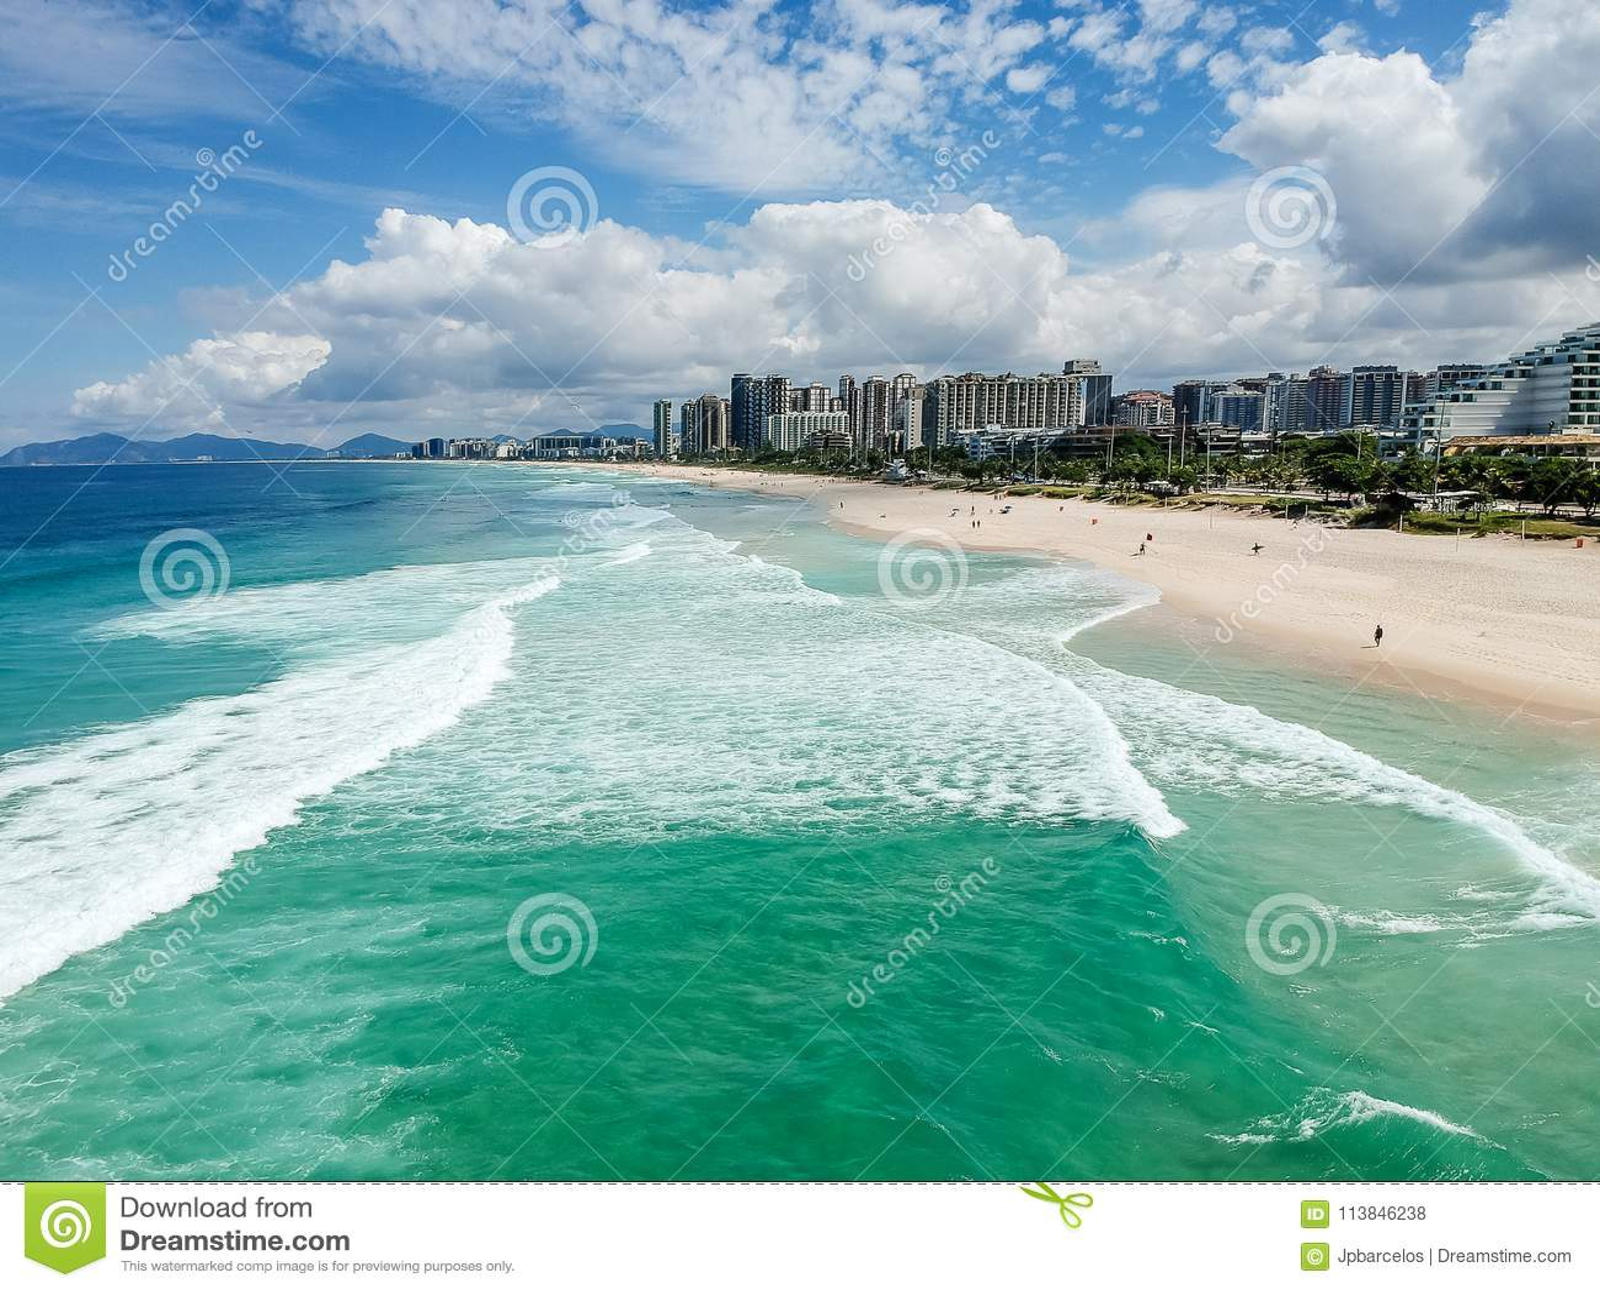 Drone photo of Barra da Tijuca beach, Rio de Janeiro, Brazil.